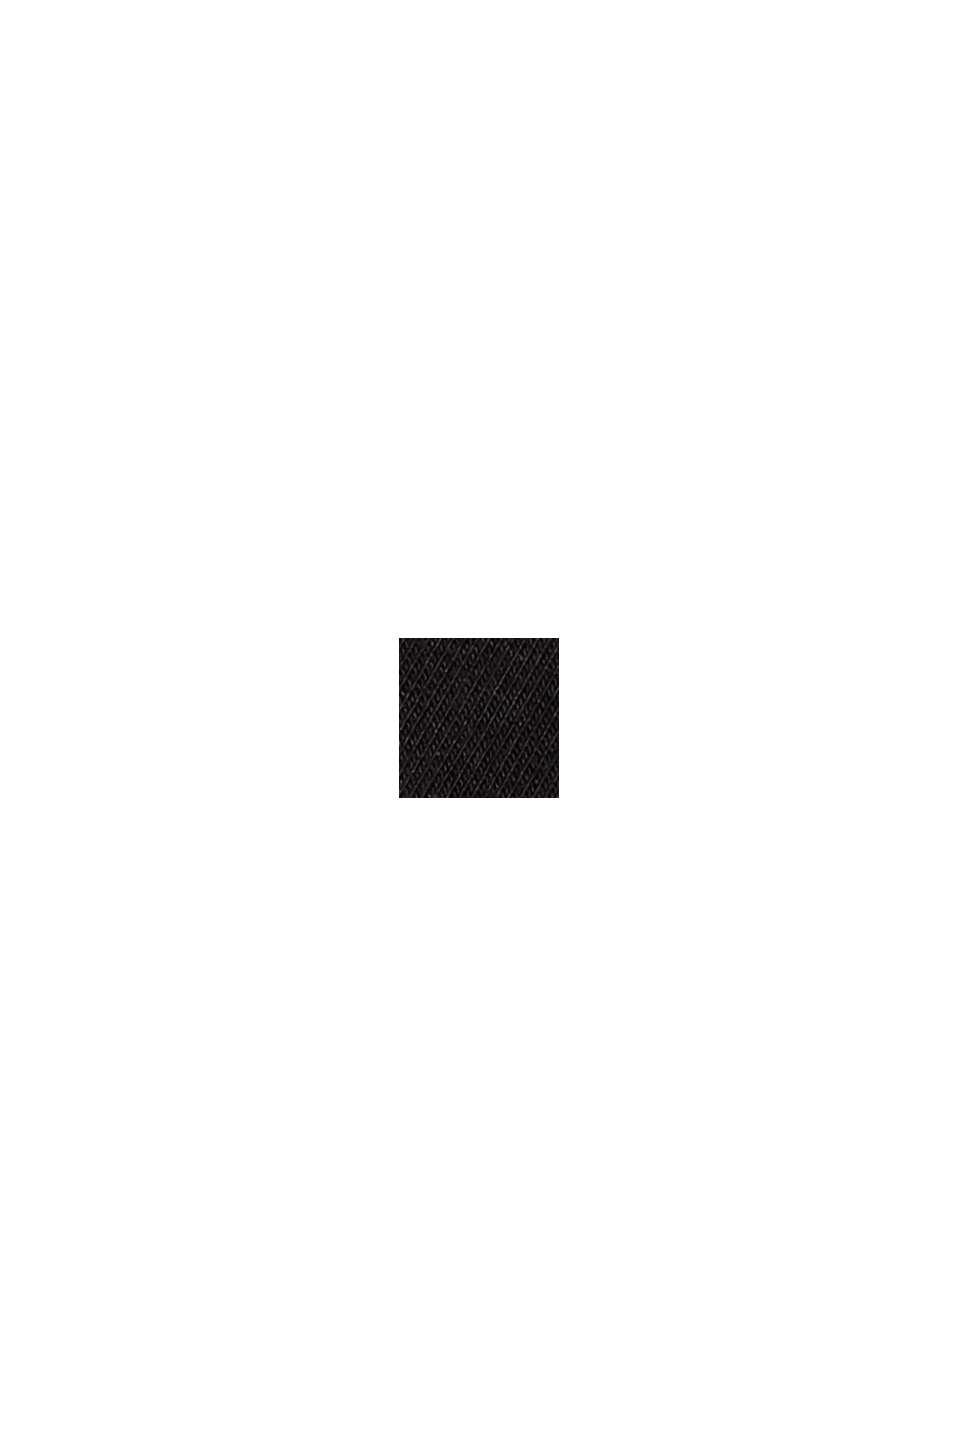 Pyjama-Shirt mit Spitze, LENZING™ ECOVERO™, BLACK, swatch